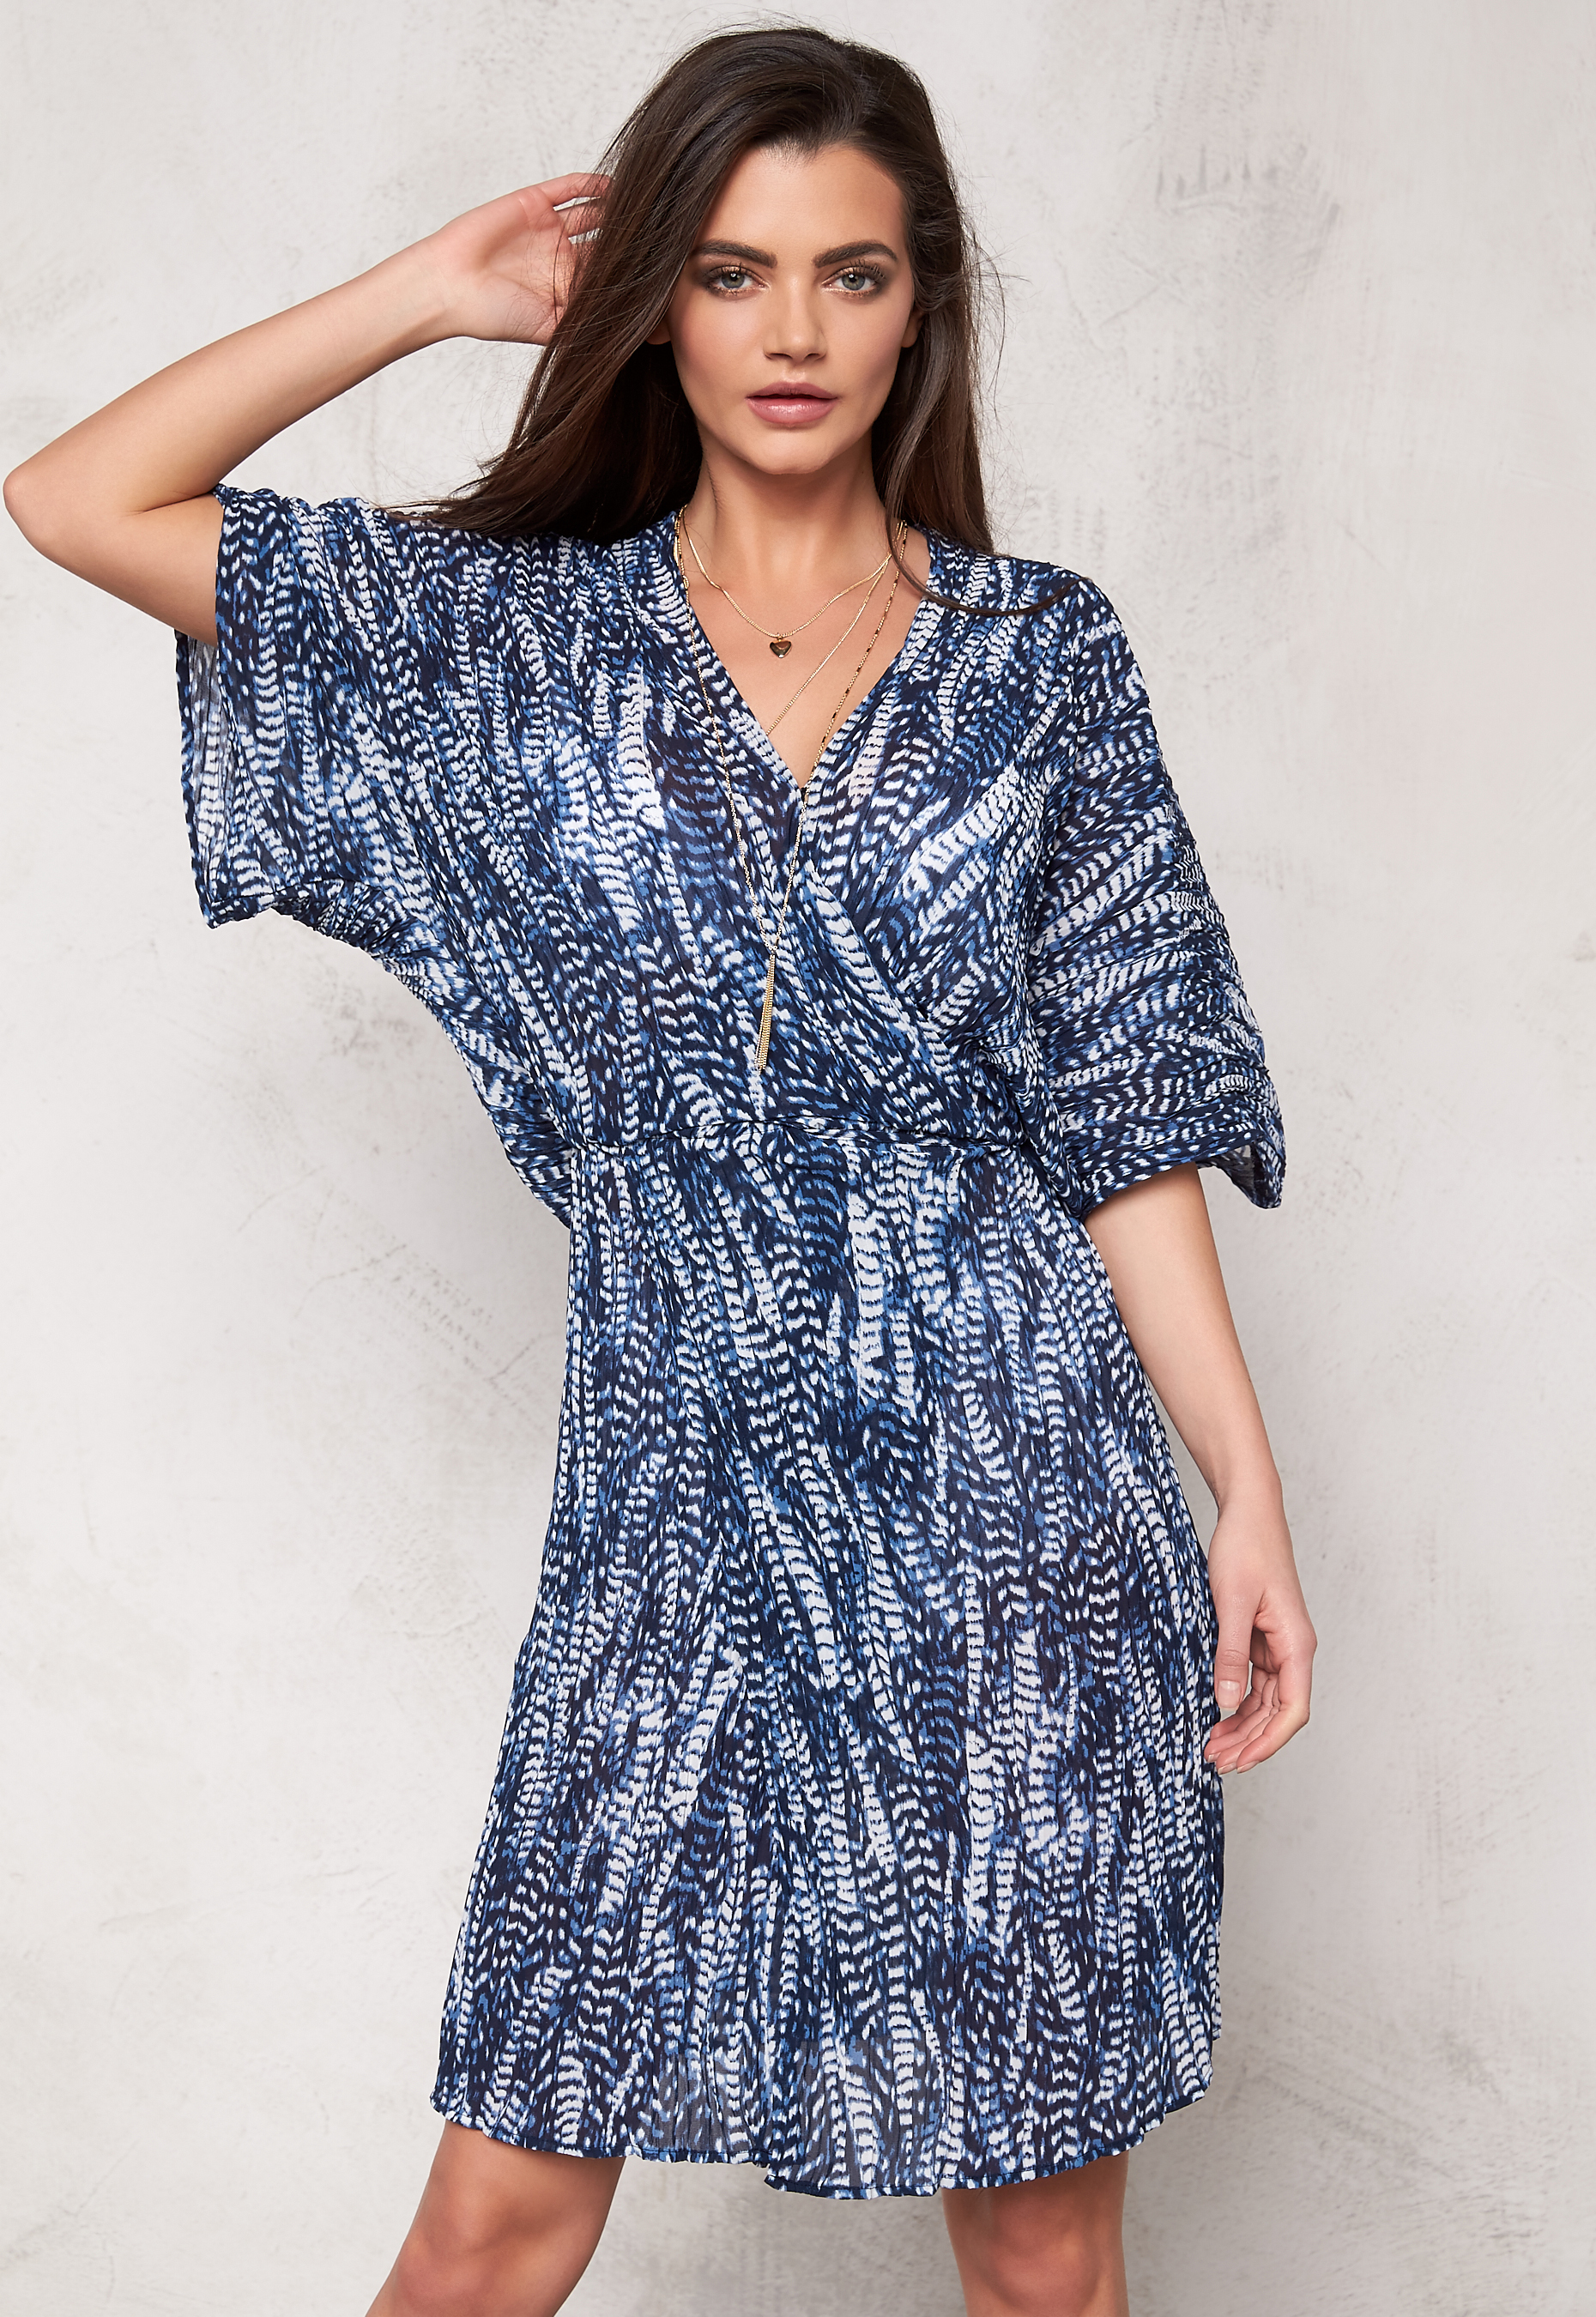 e17e917b81a Make Way Suki Dress Dark blue   White   Patterned - Bubbleroom